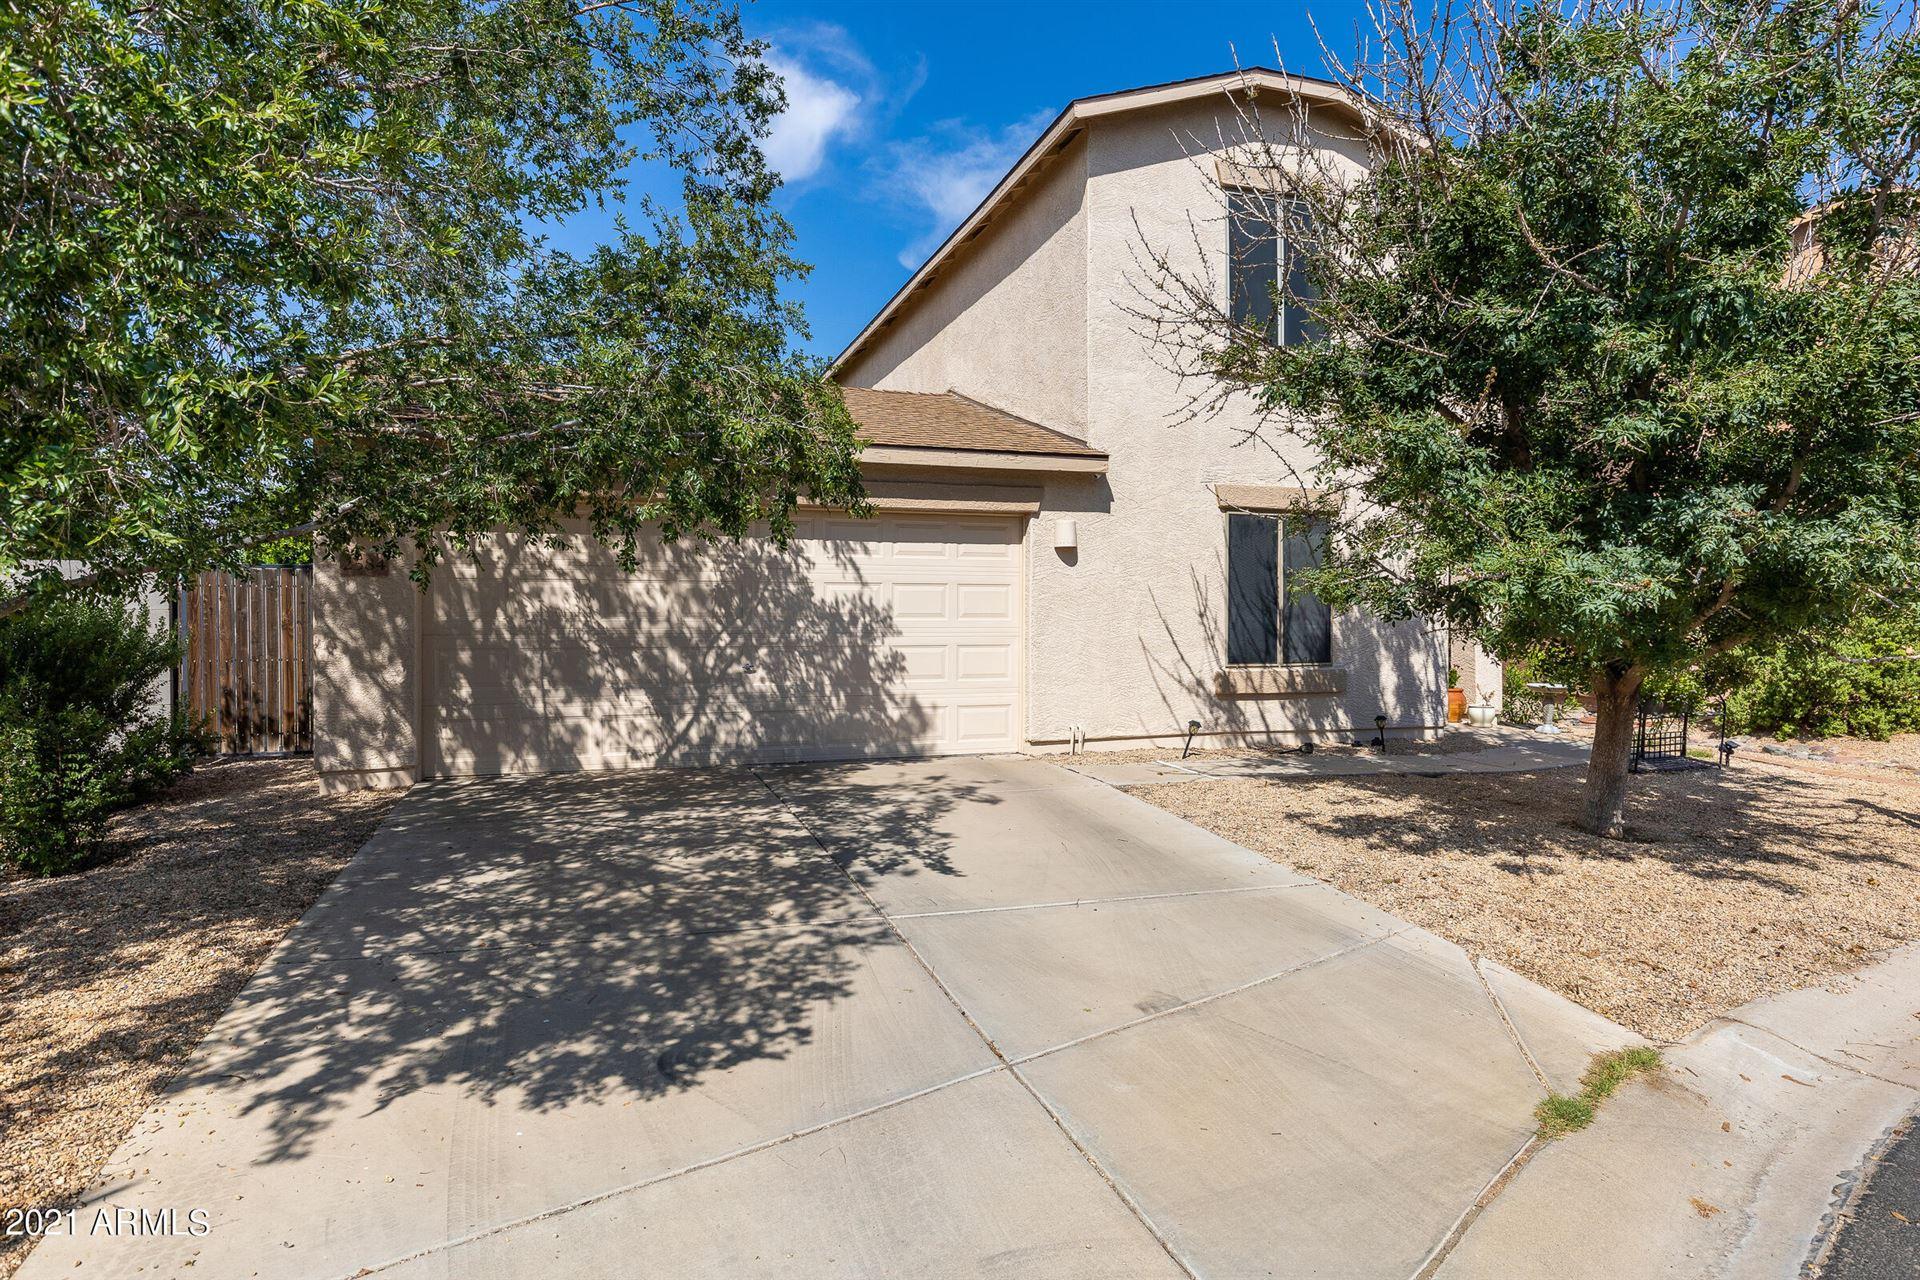 Photo of 2584 E MEADOW LARK Way, San Tan Valley, AZ 85140 (MLS # 6292794)